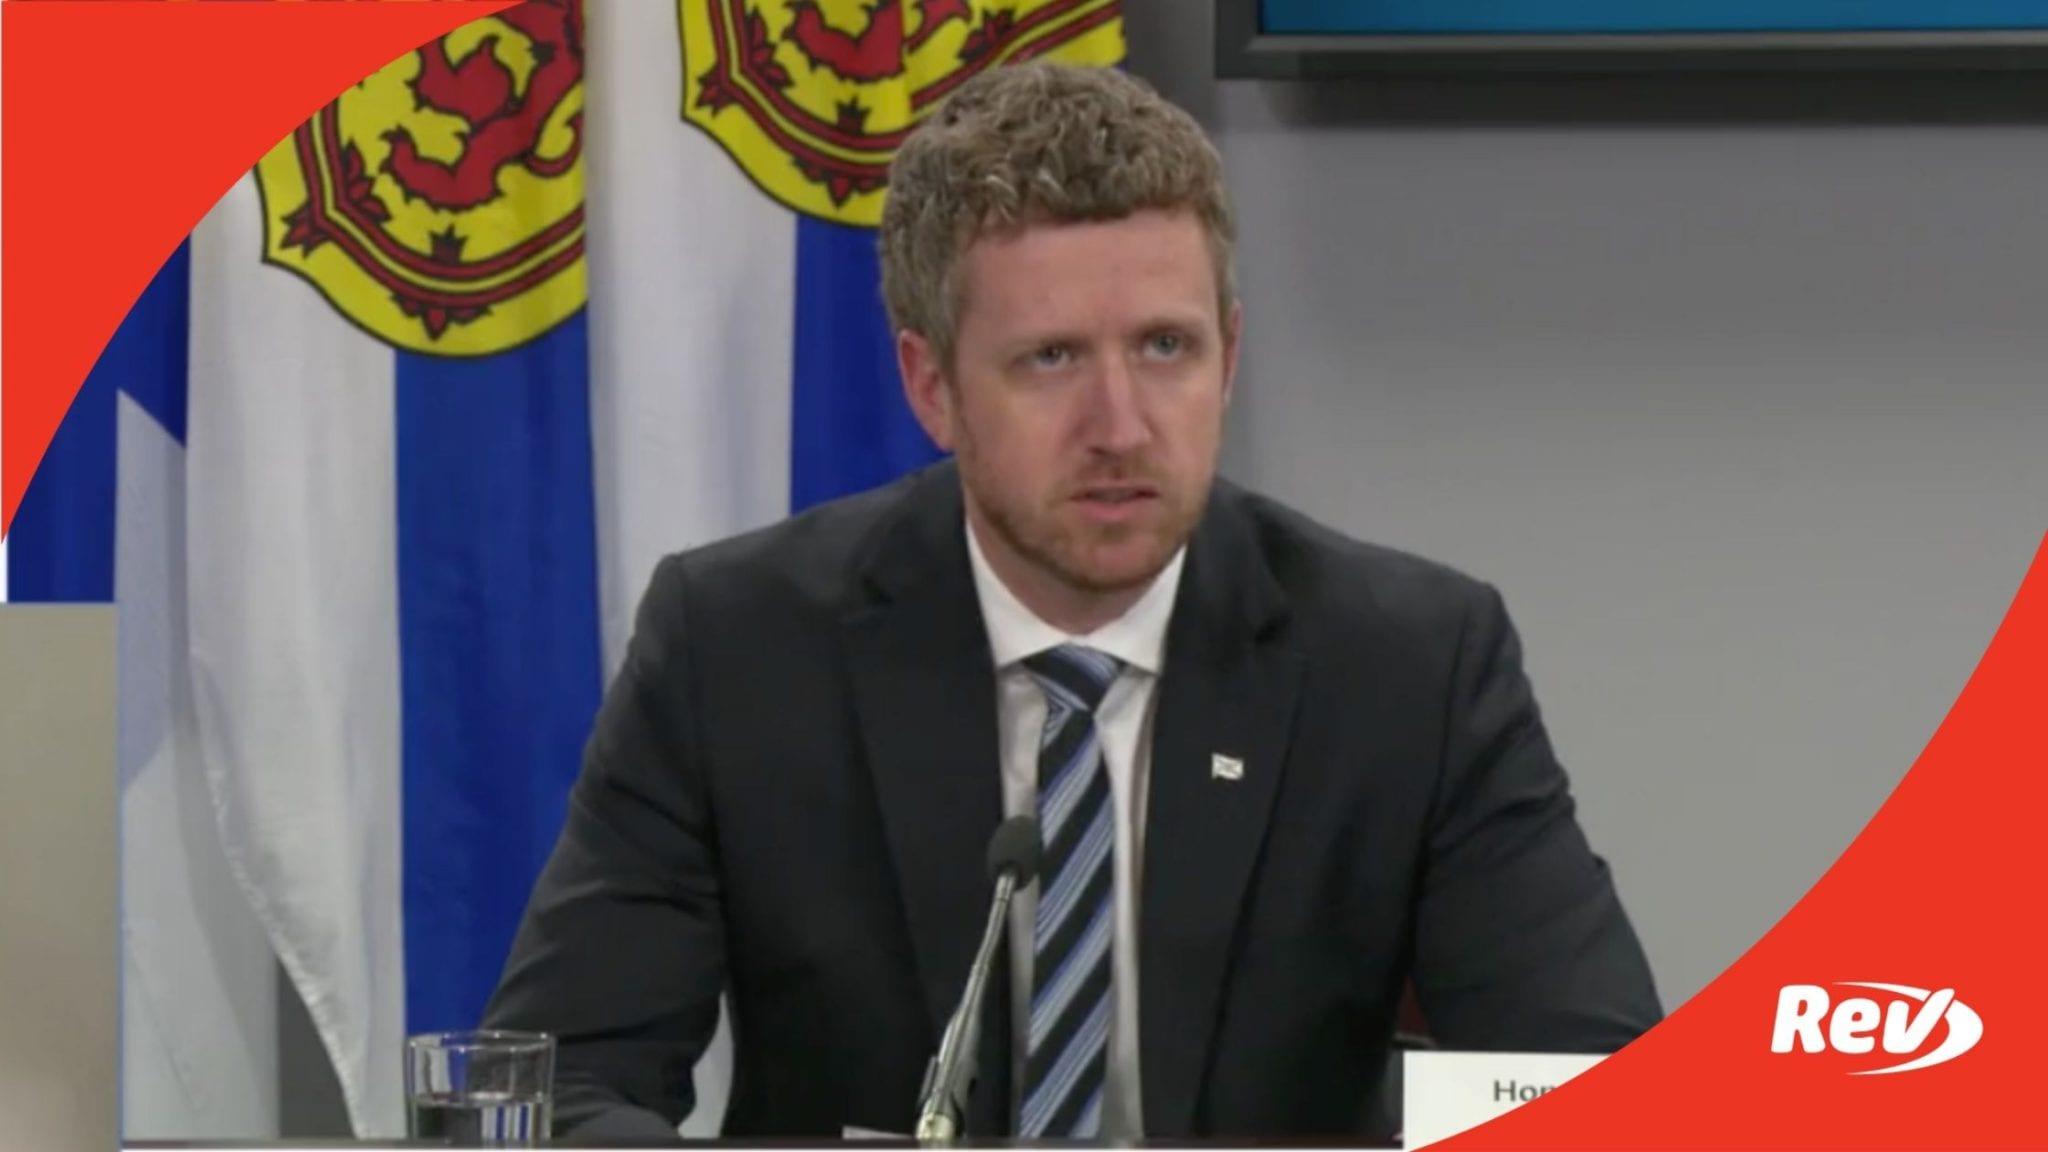 Nova Scotia Canada COVID-19 Press Conference Transcript May 7